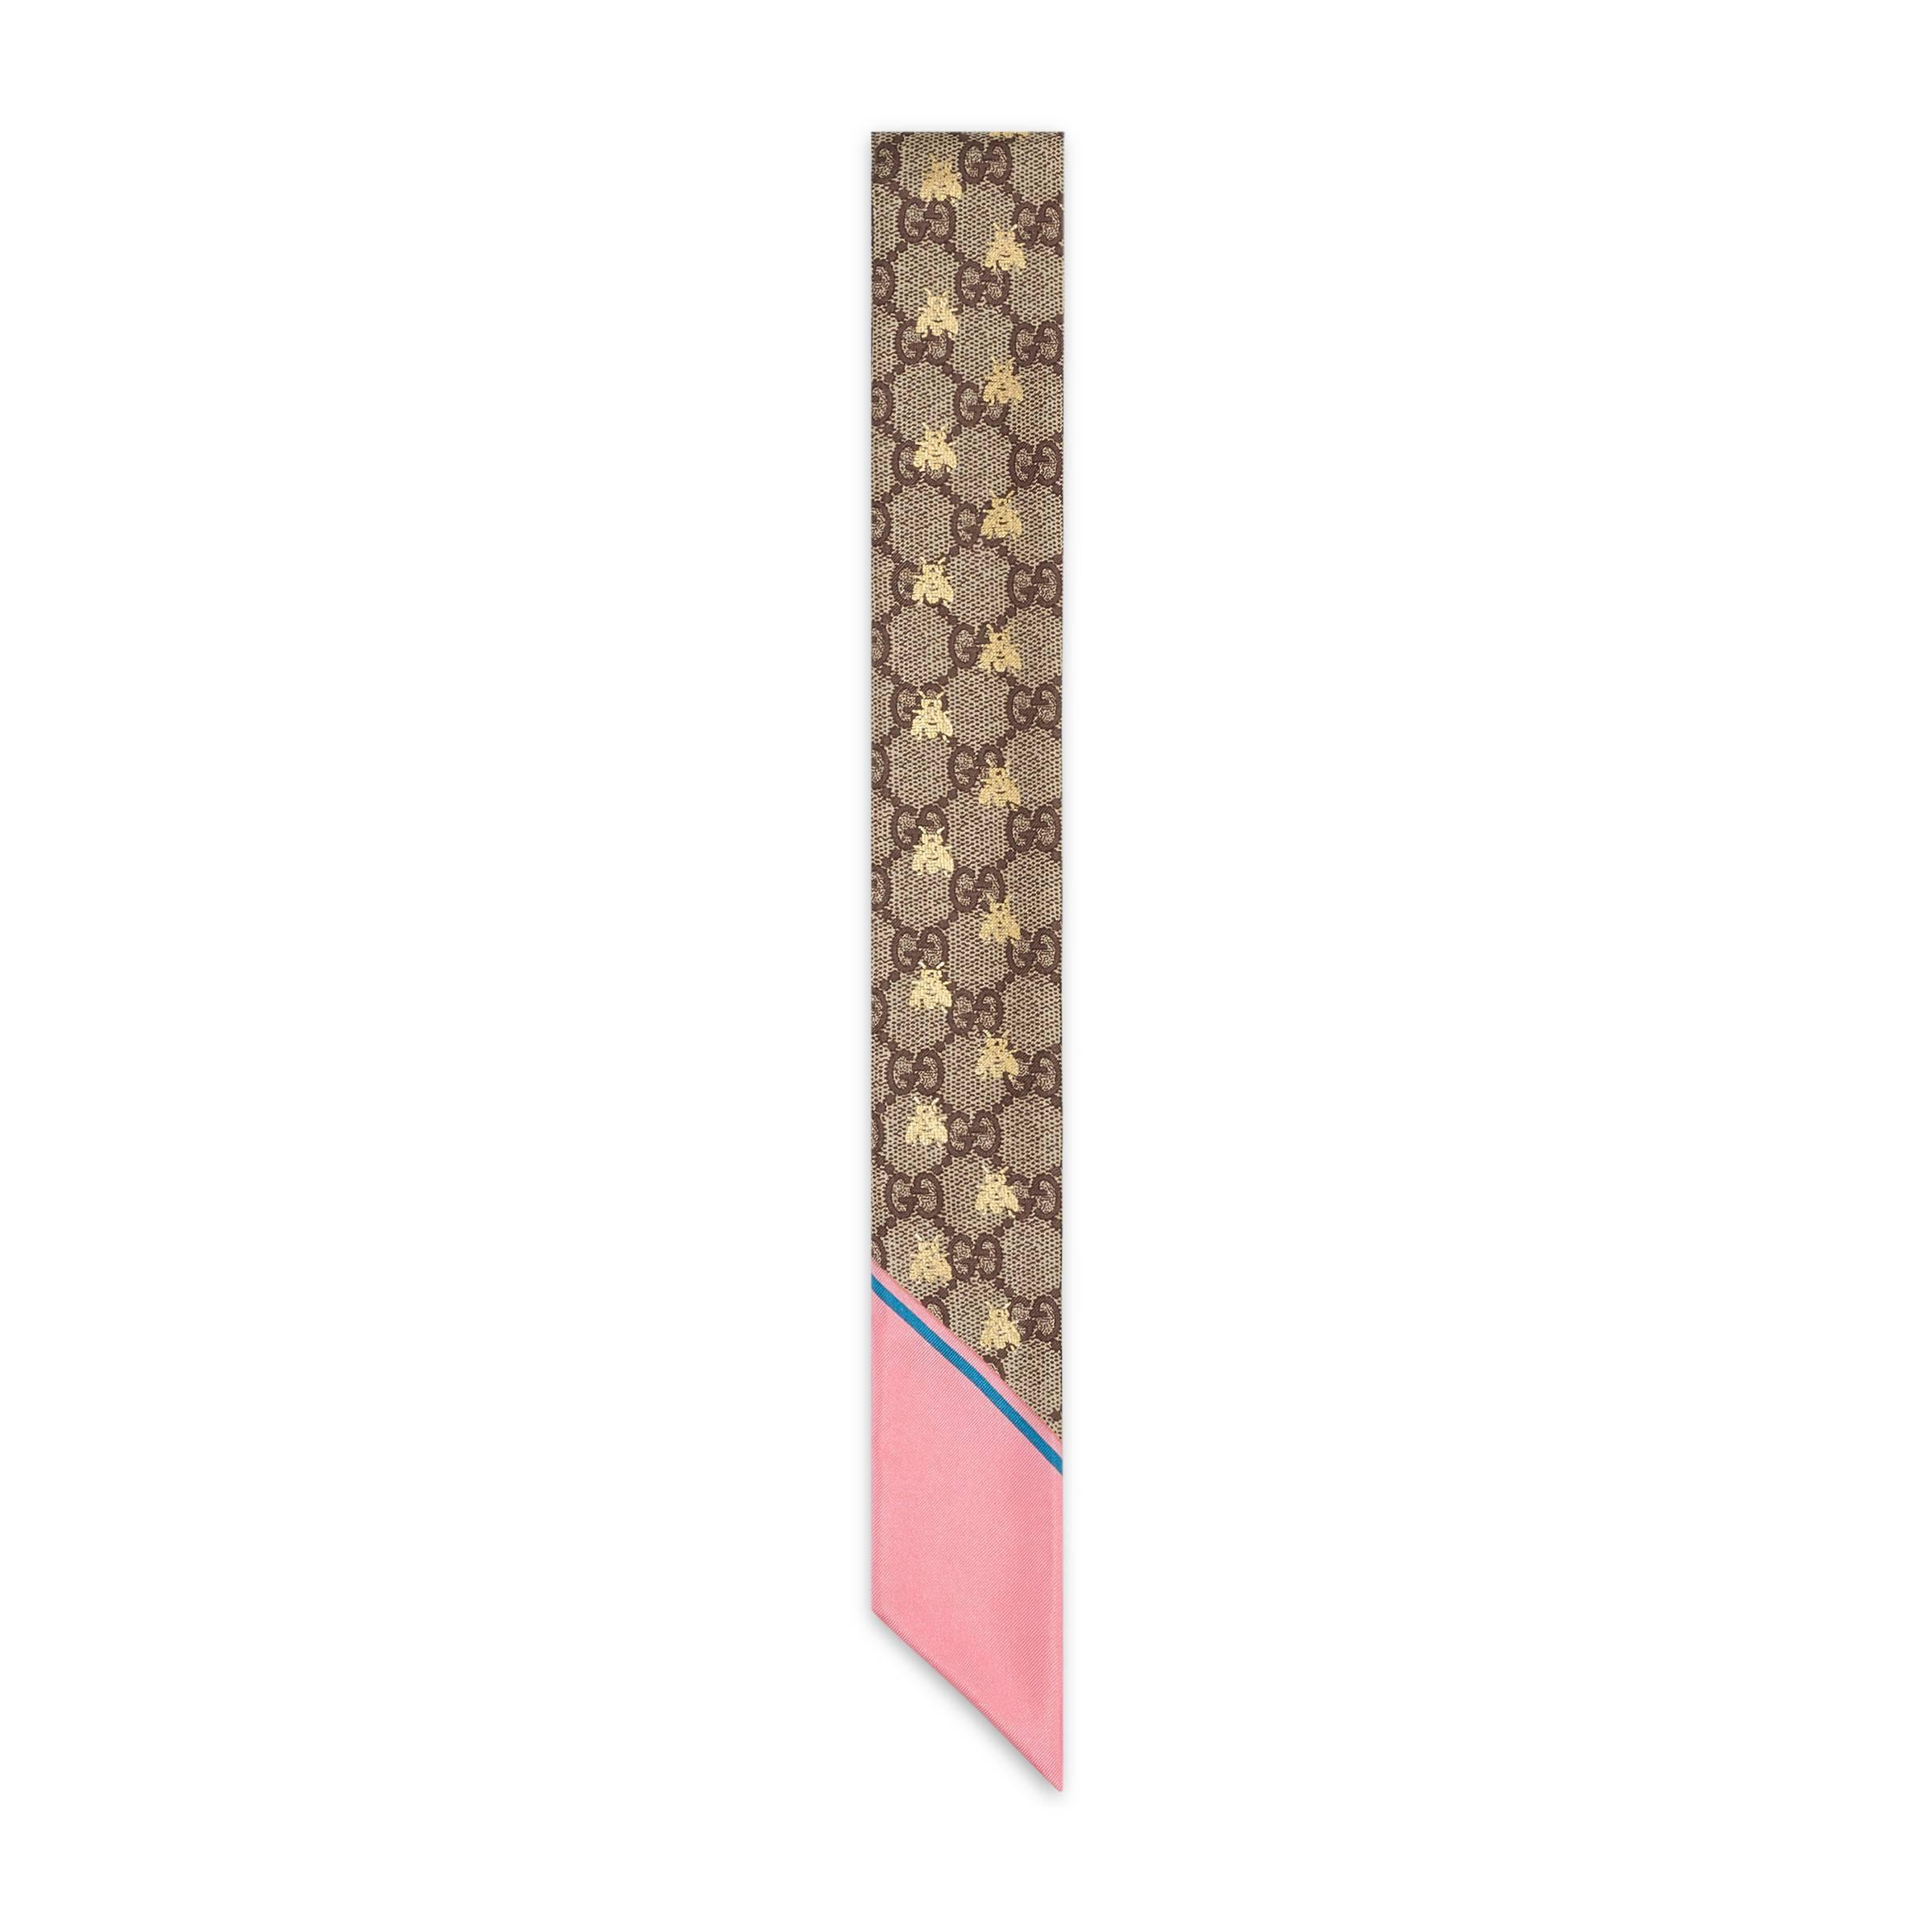 7708169a2 Lazo de Seda GG con Abejas Gucci de color Neutro - Lyst